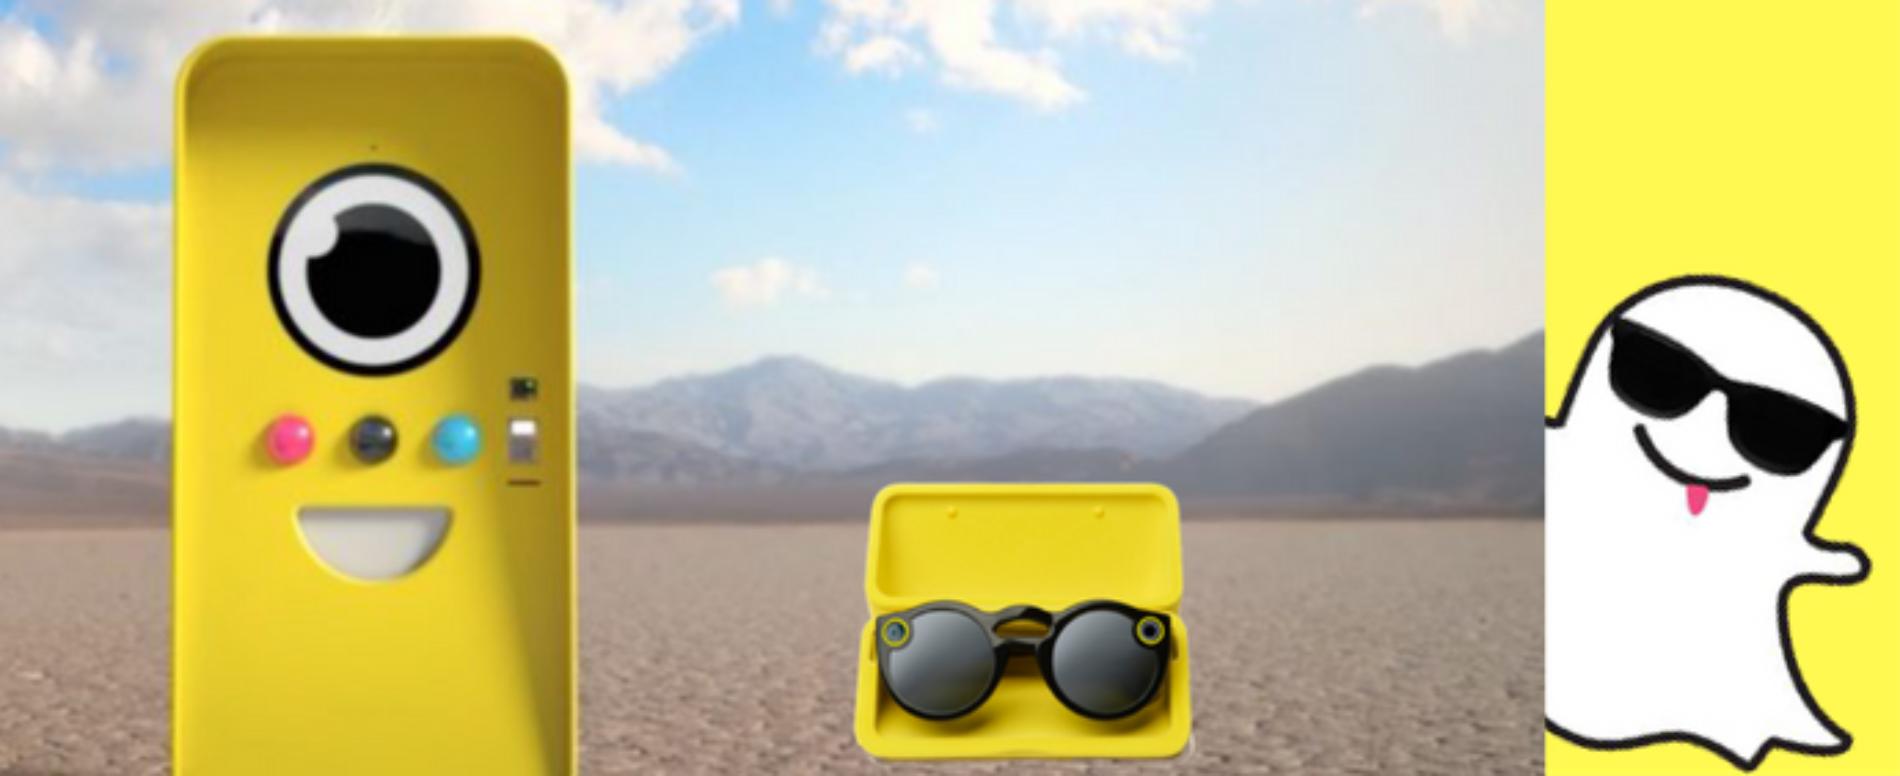 Tutti pazzi per la Snapchat vending machine!